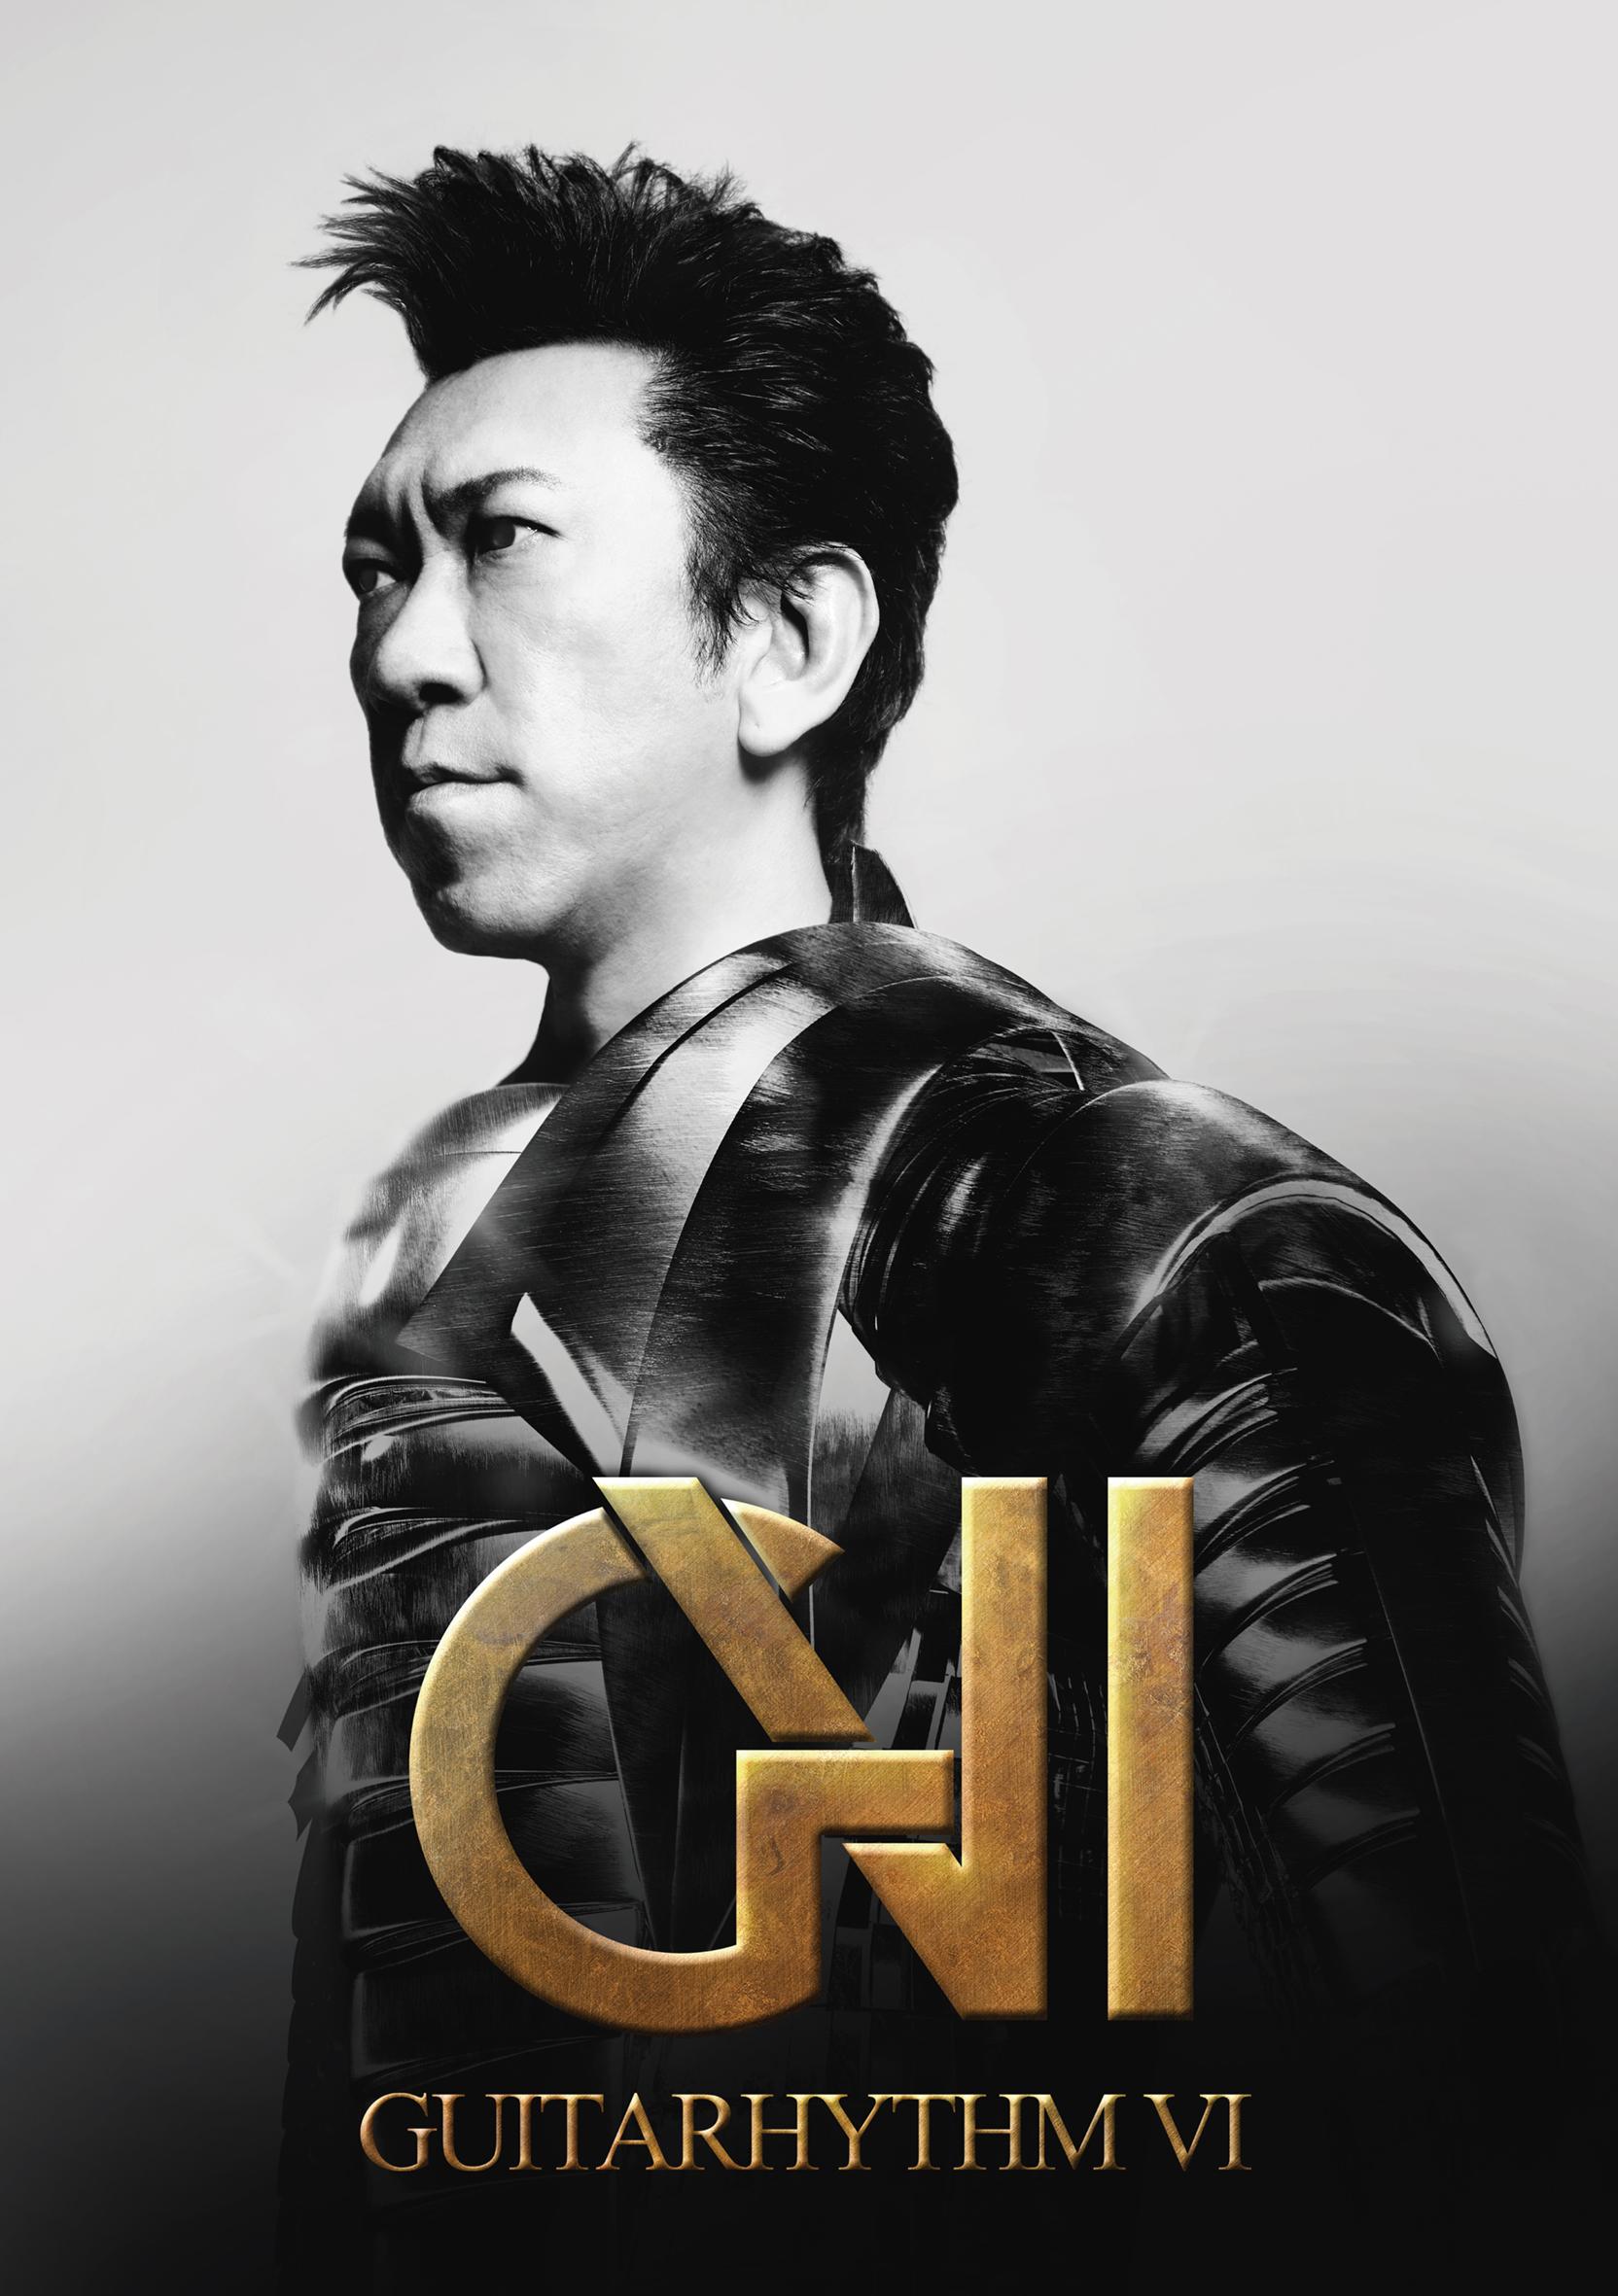 『GUITARHYTHM Ⅵ』ジャケット写真(初回生産限定盤DVD+BD)